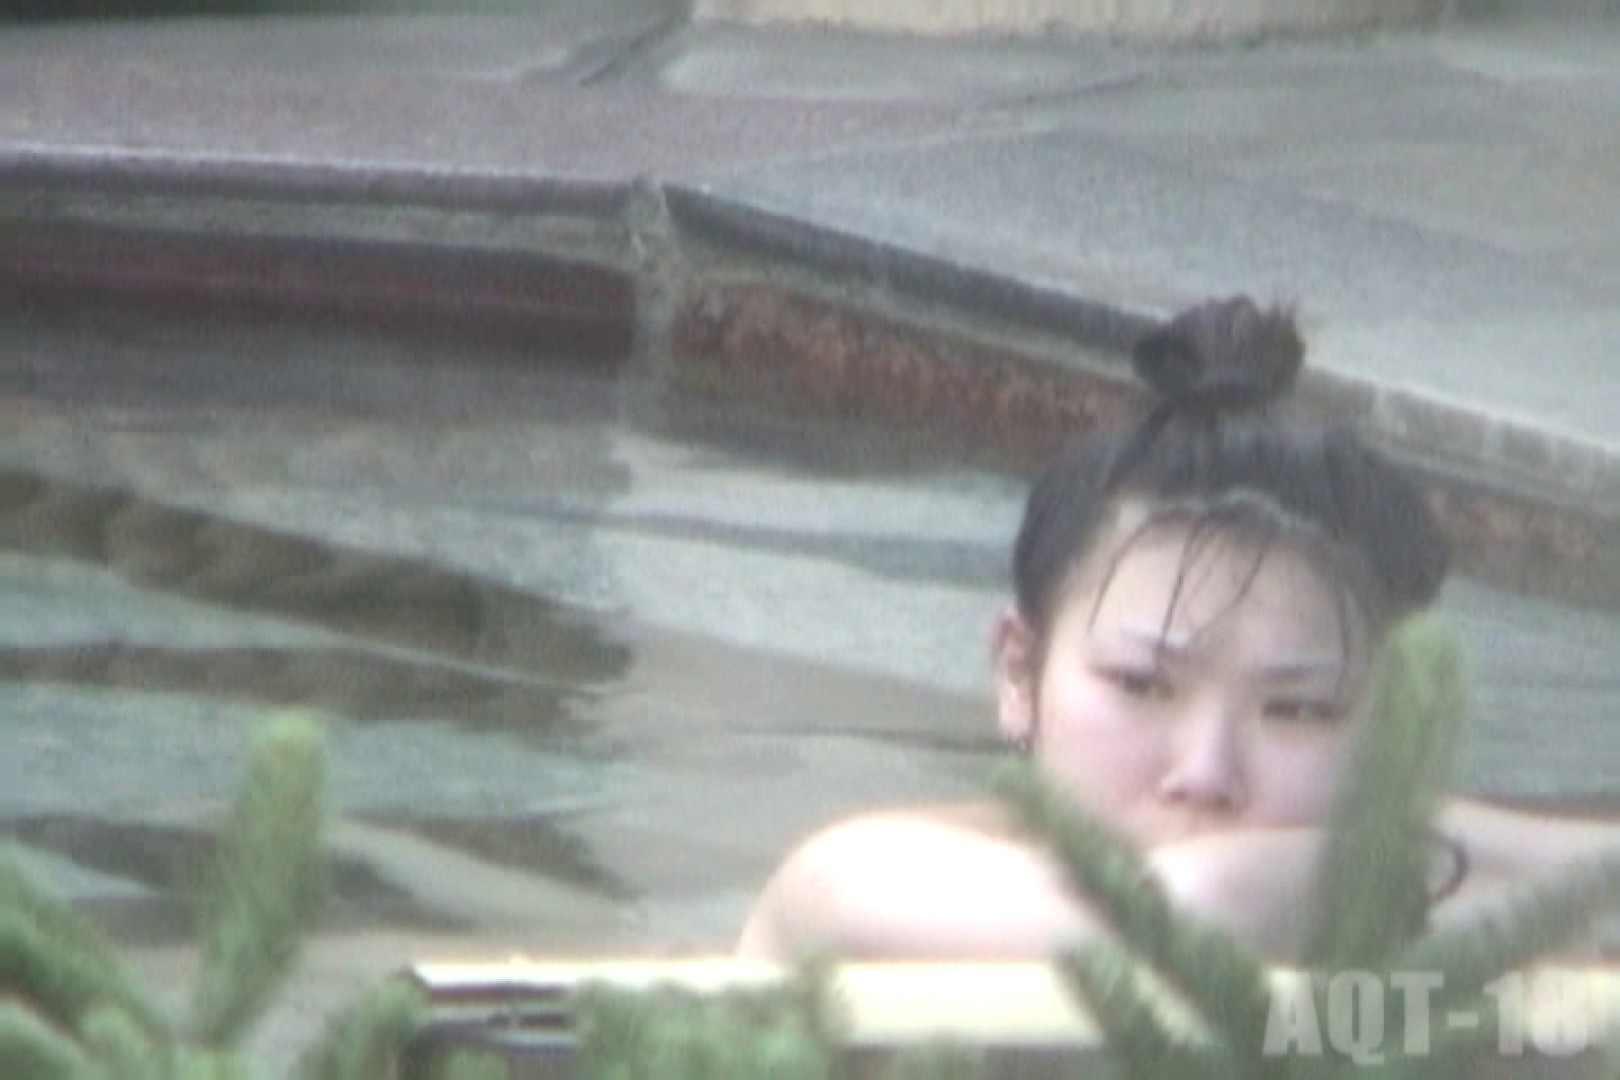 Aquaな露天風呂Vol.855 露天風呂編  86PIX 78